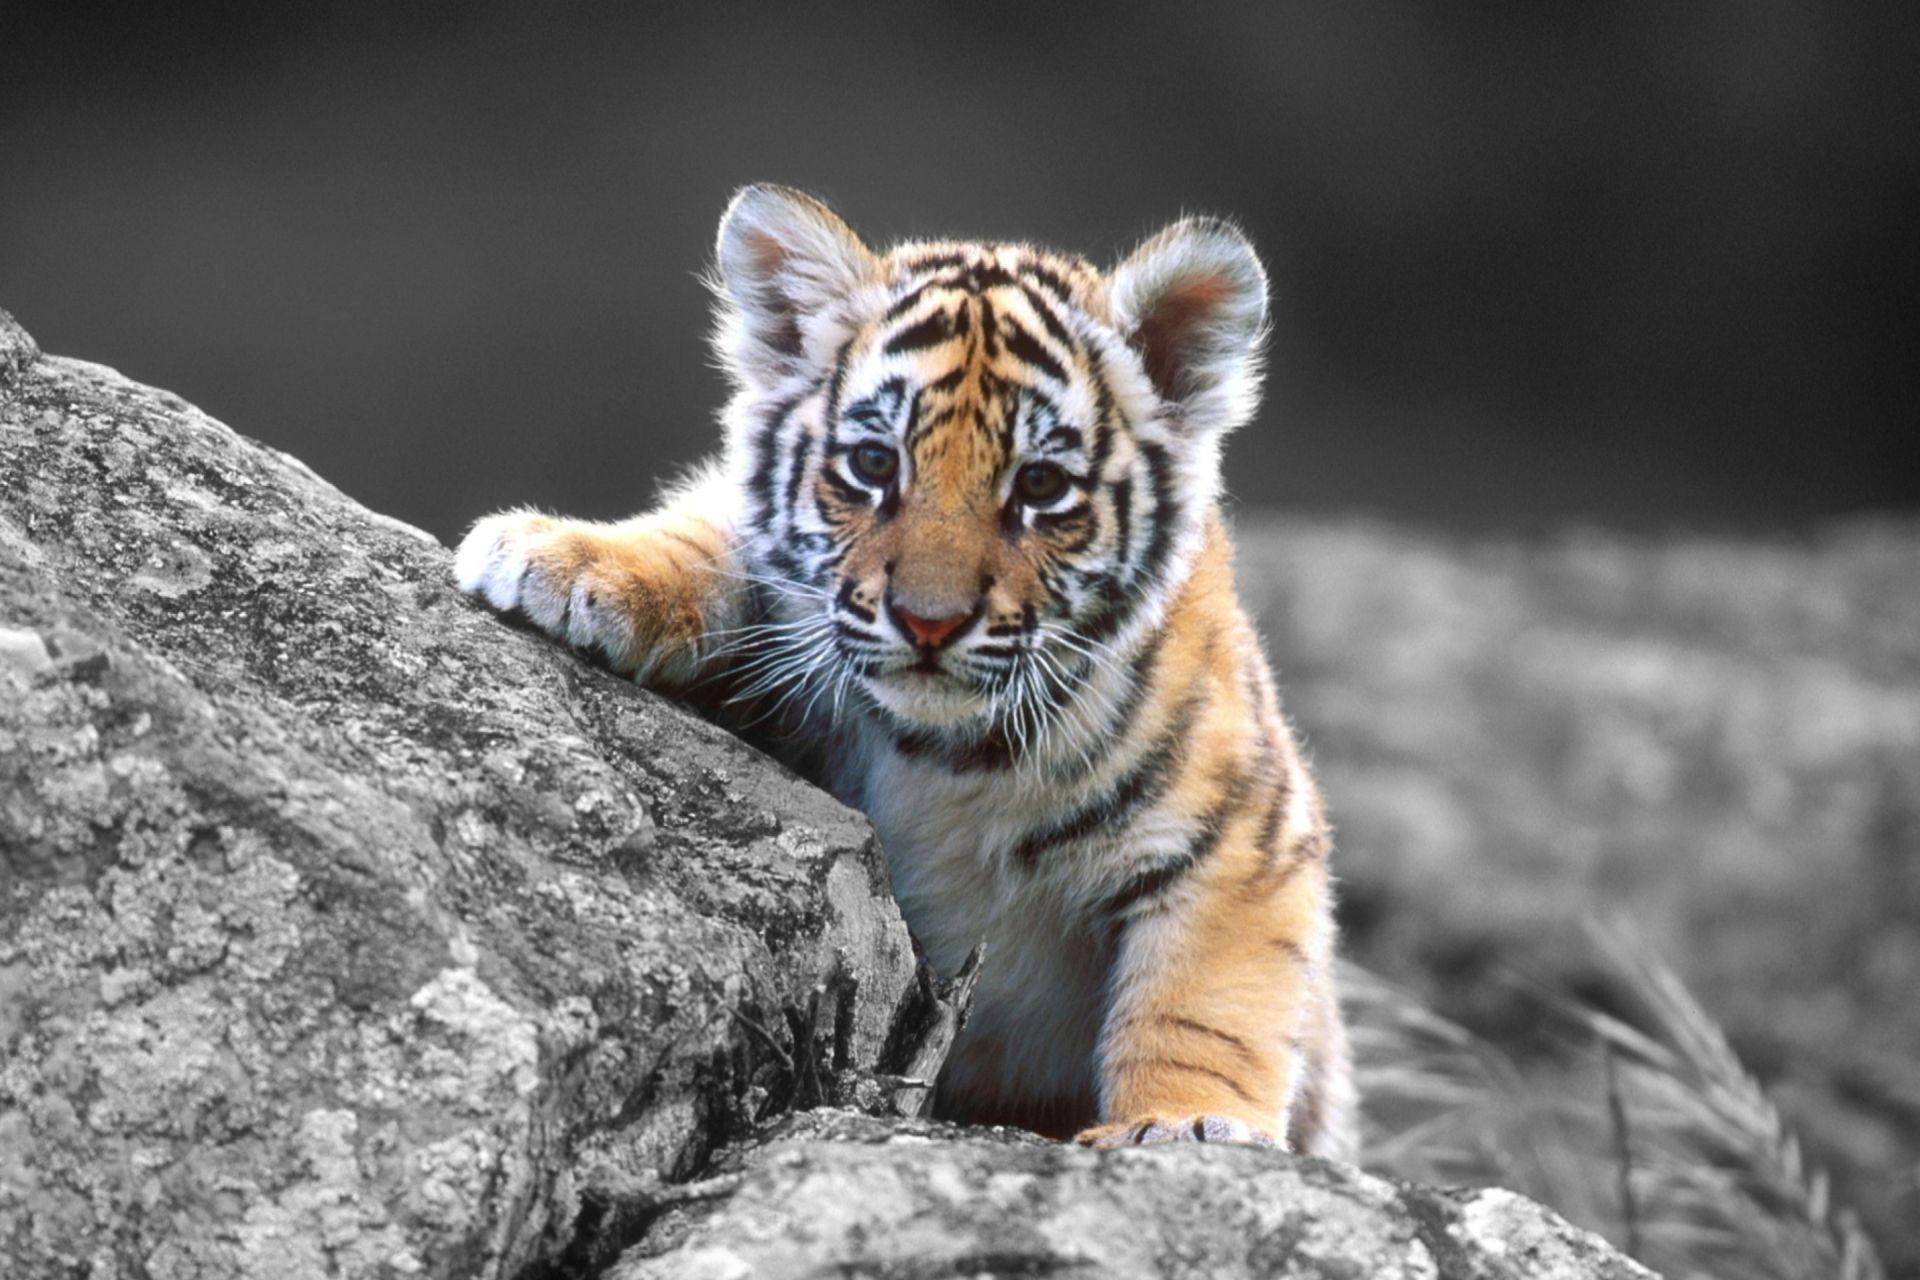 Tiger Baby, Nice Wallpaper